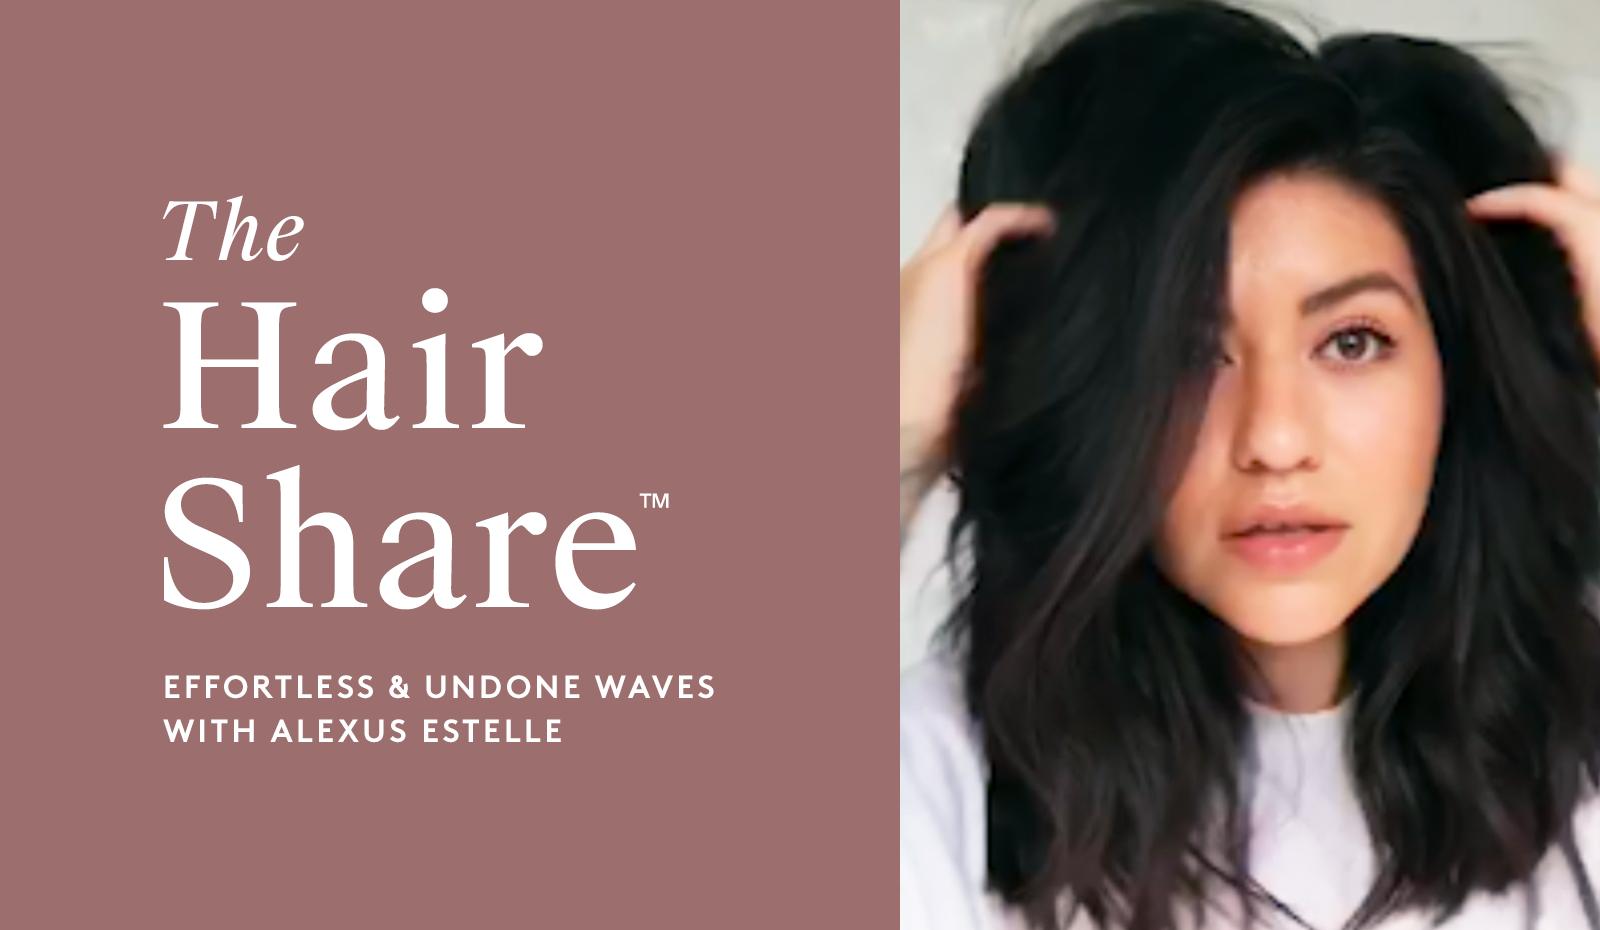 The Hair Share®: Effortless & Undone Waves with Alexus Estelle